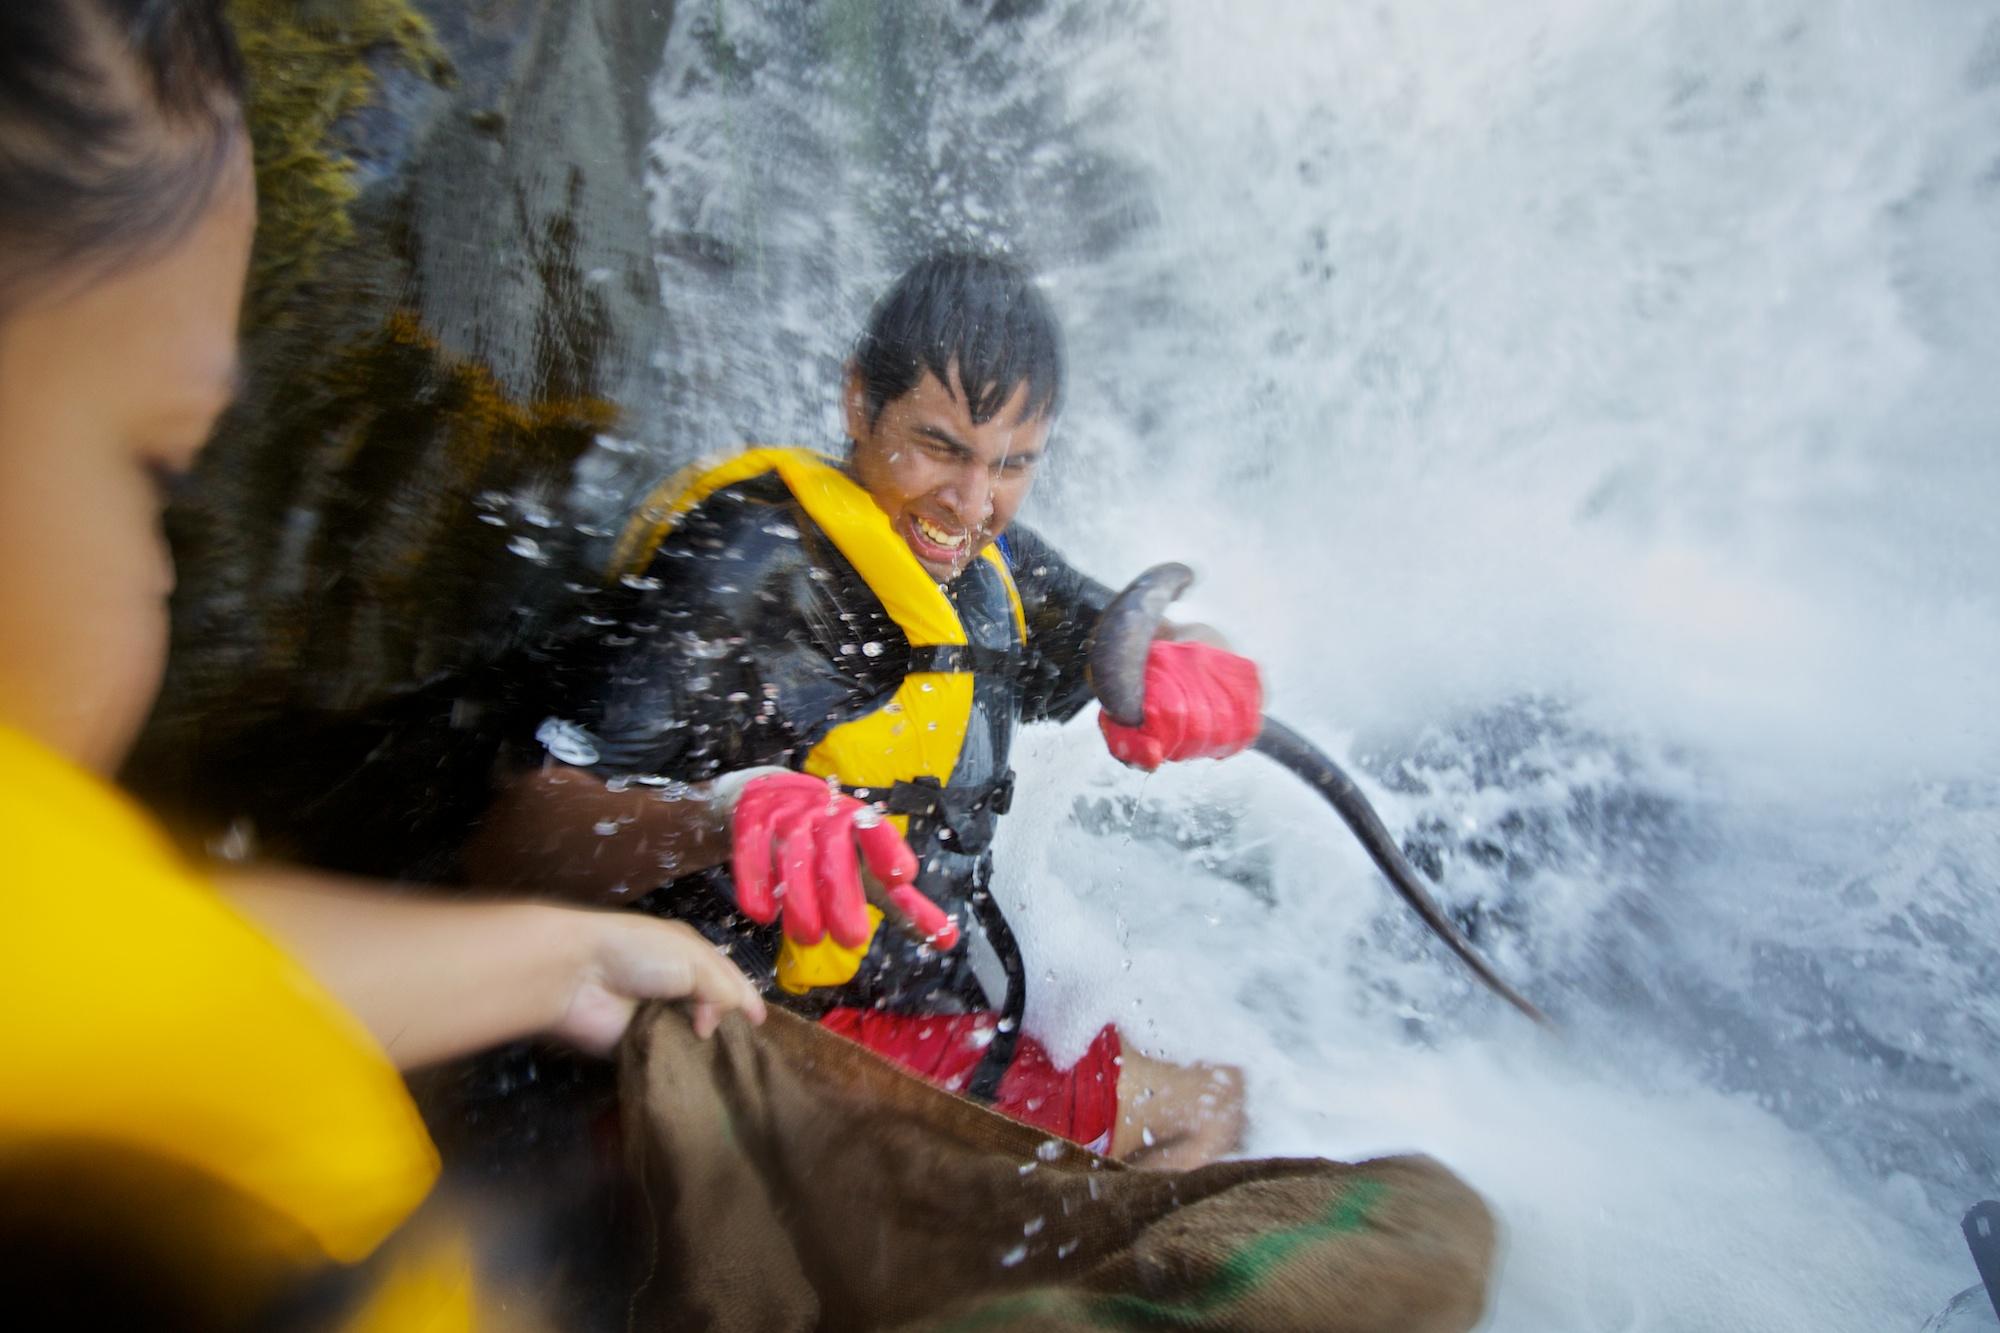 Lamprey harvesting at the Willamette Falls. Thomas Boyd/The Oregonian